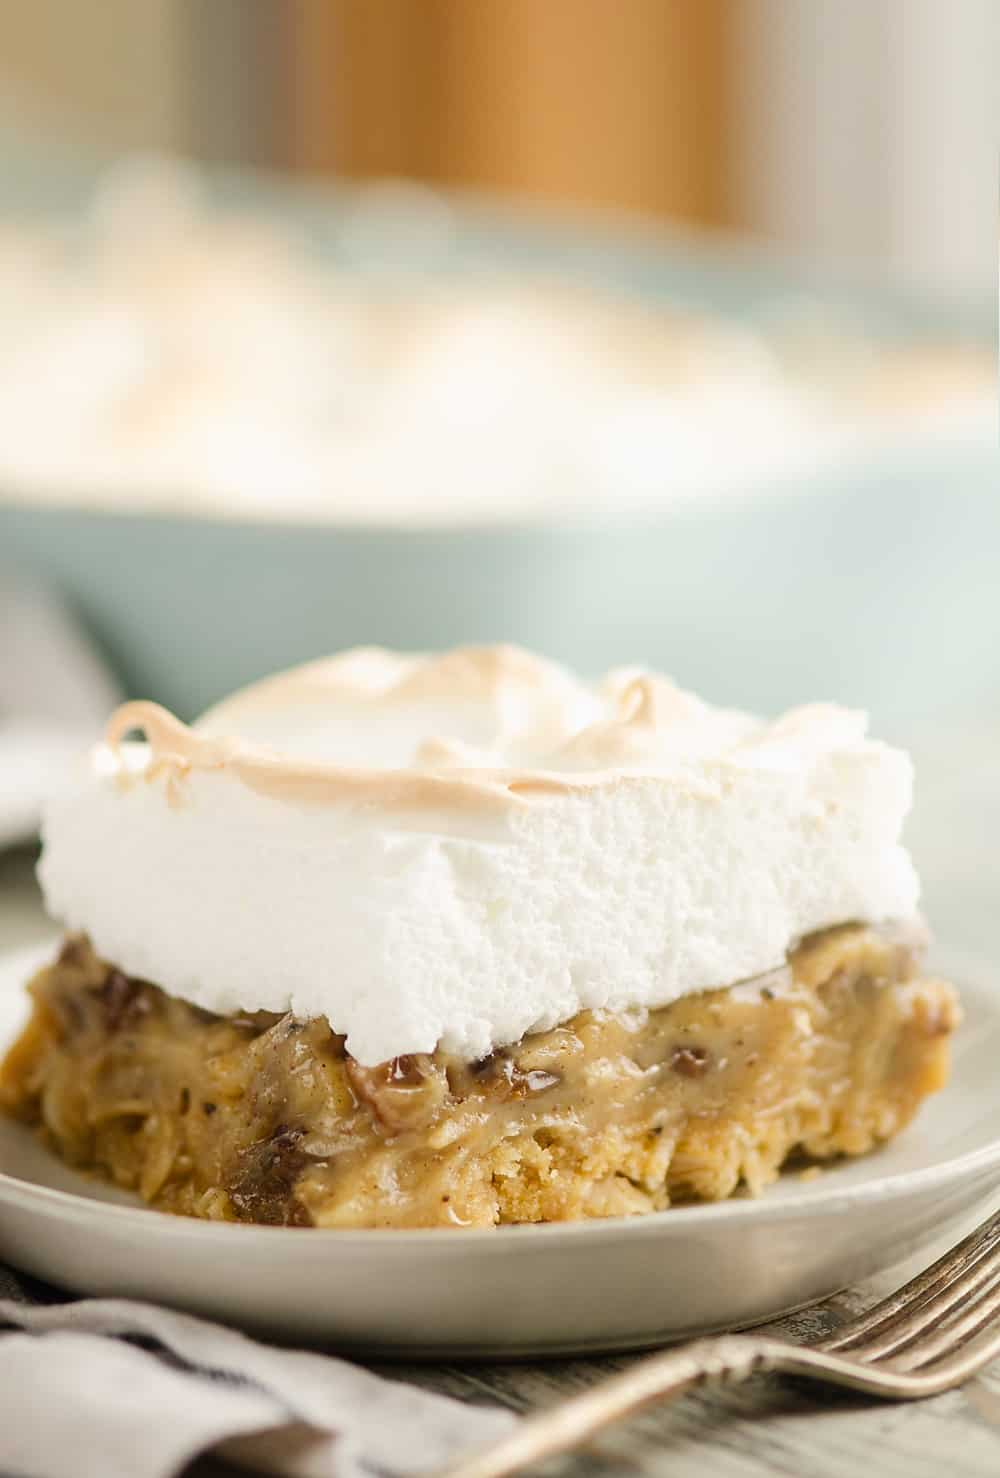 Sour Cream Raisin Meringue Bars on plate